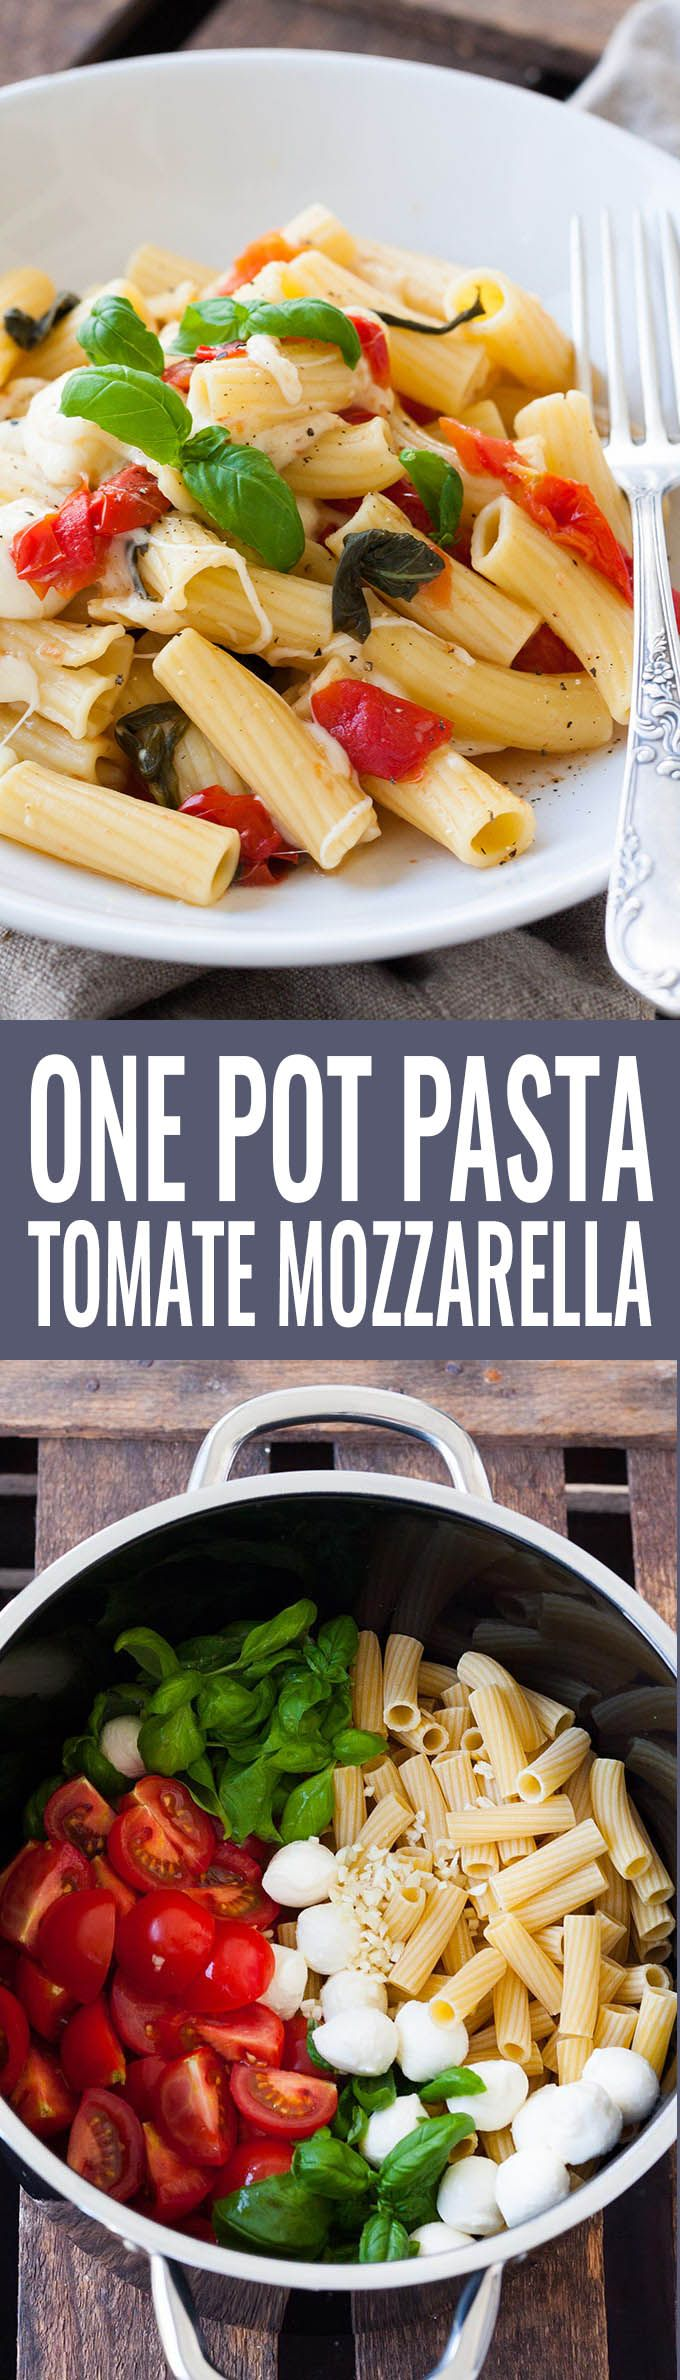 One Pot Pasta mit Tomaten und Mozzarella